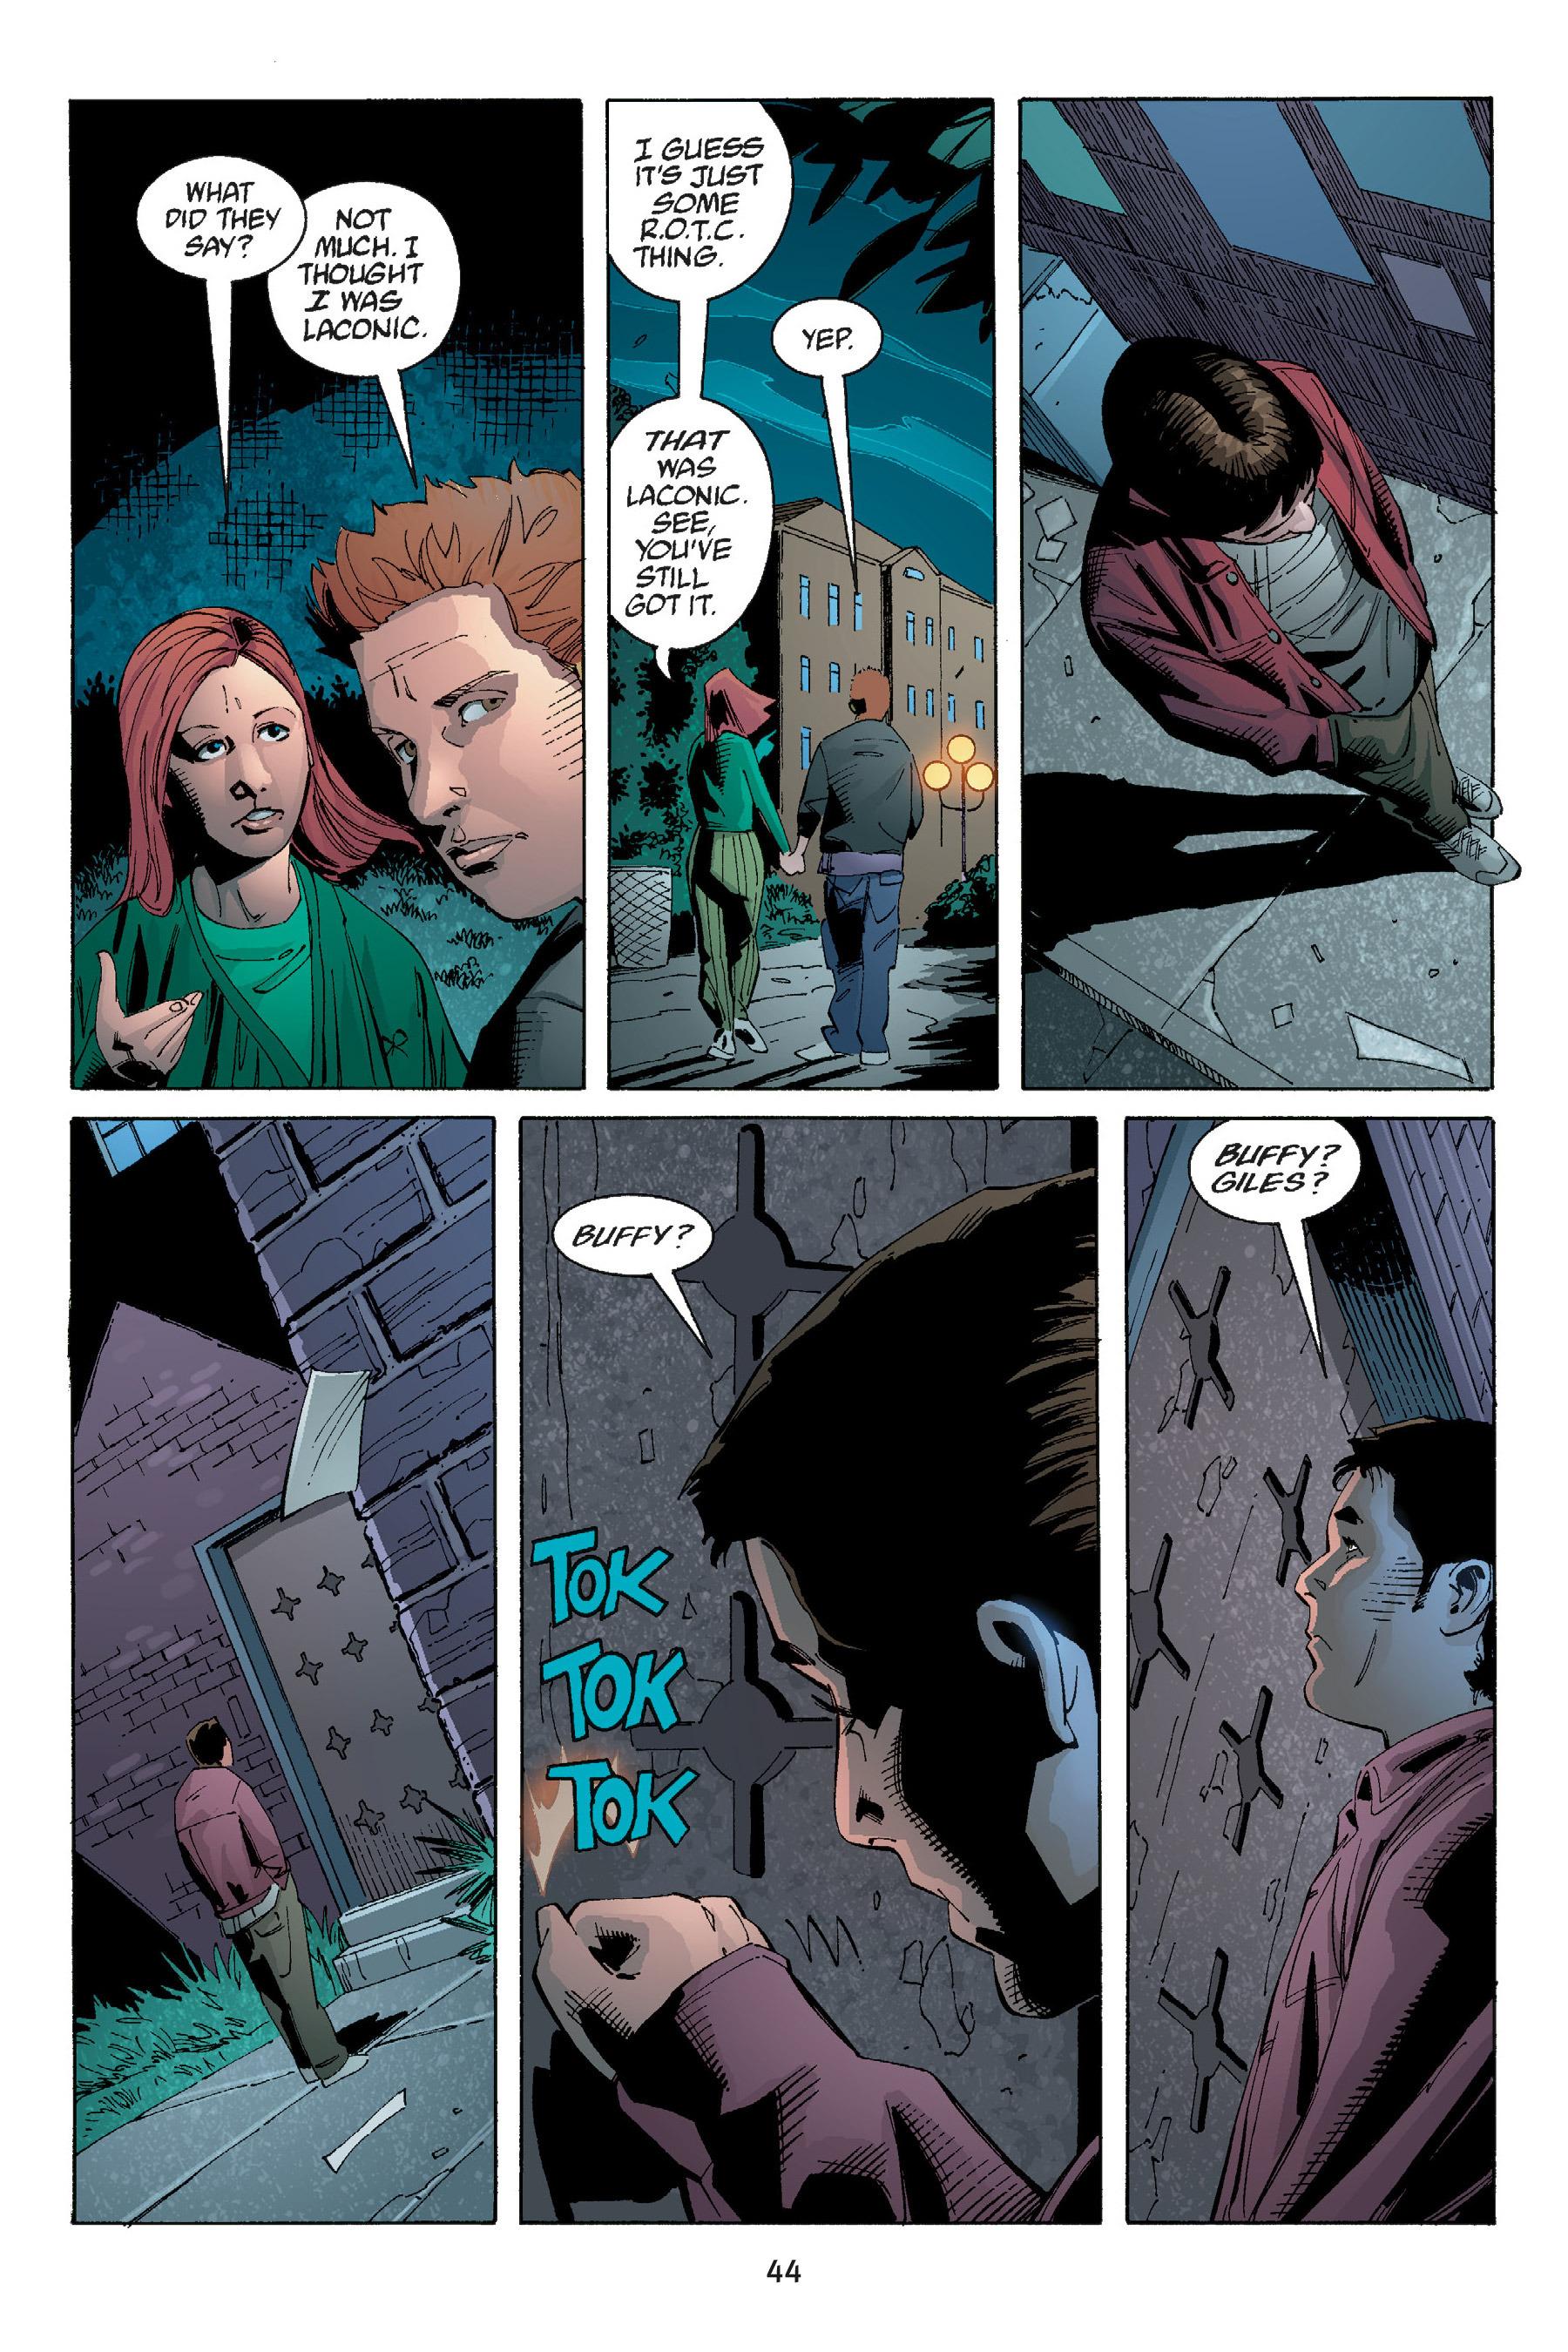 Read online Buffy the Vampire Slayer: Omnibus comic -  Issue # TPB 5 - 45